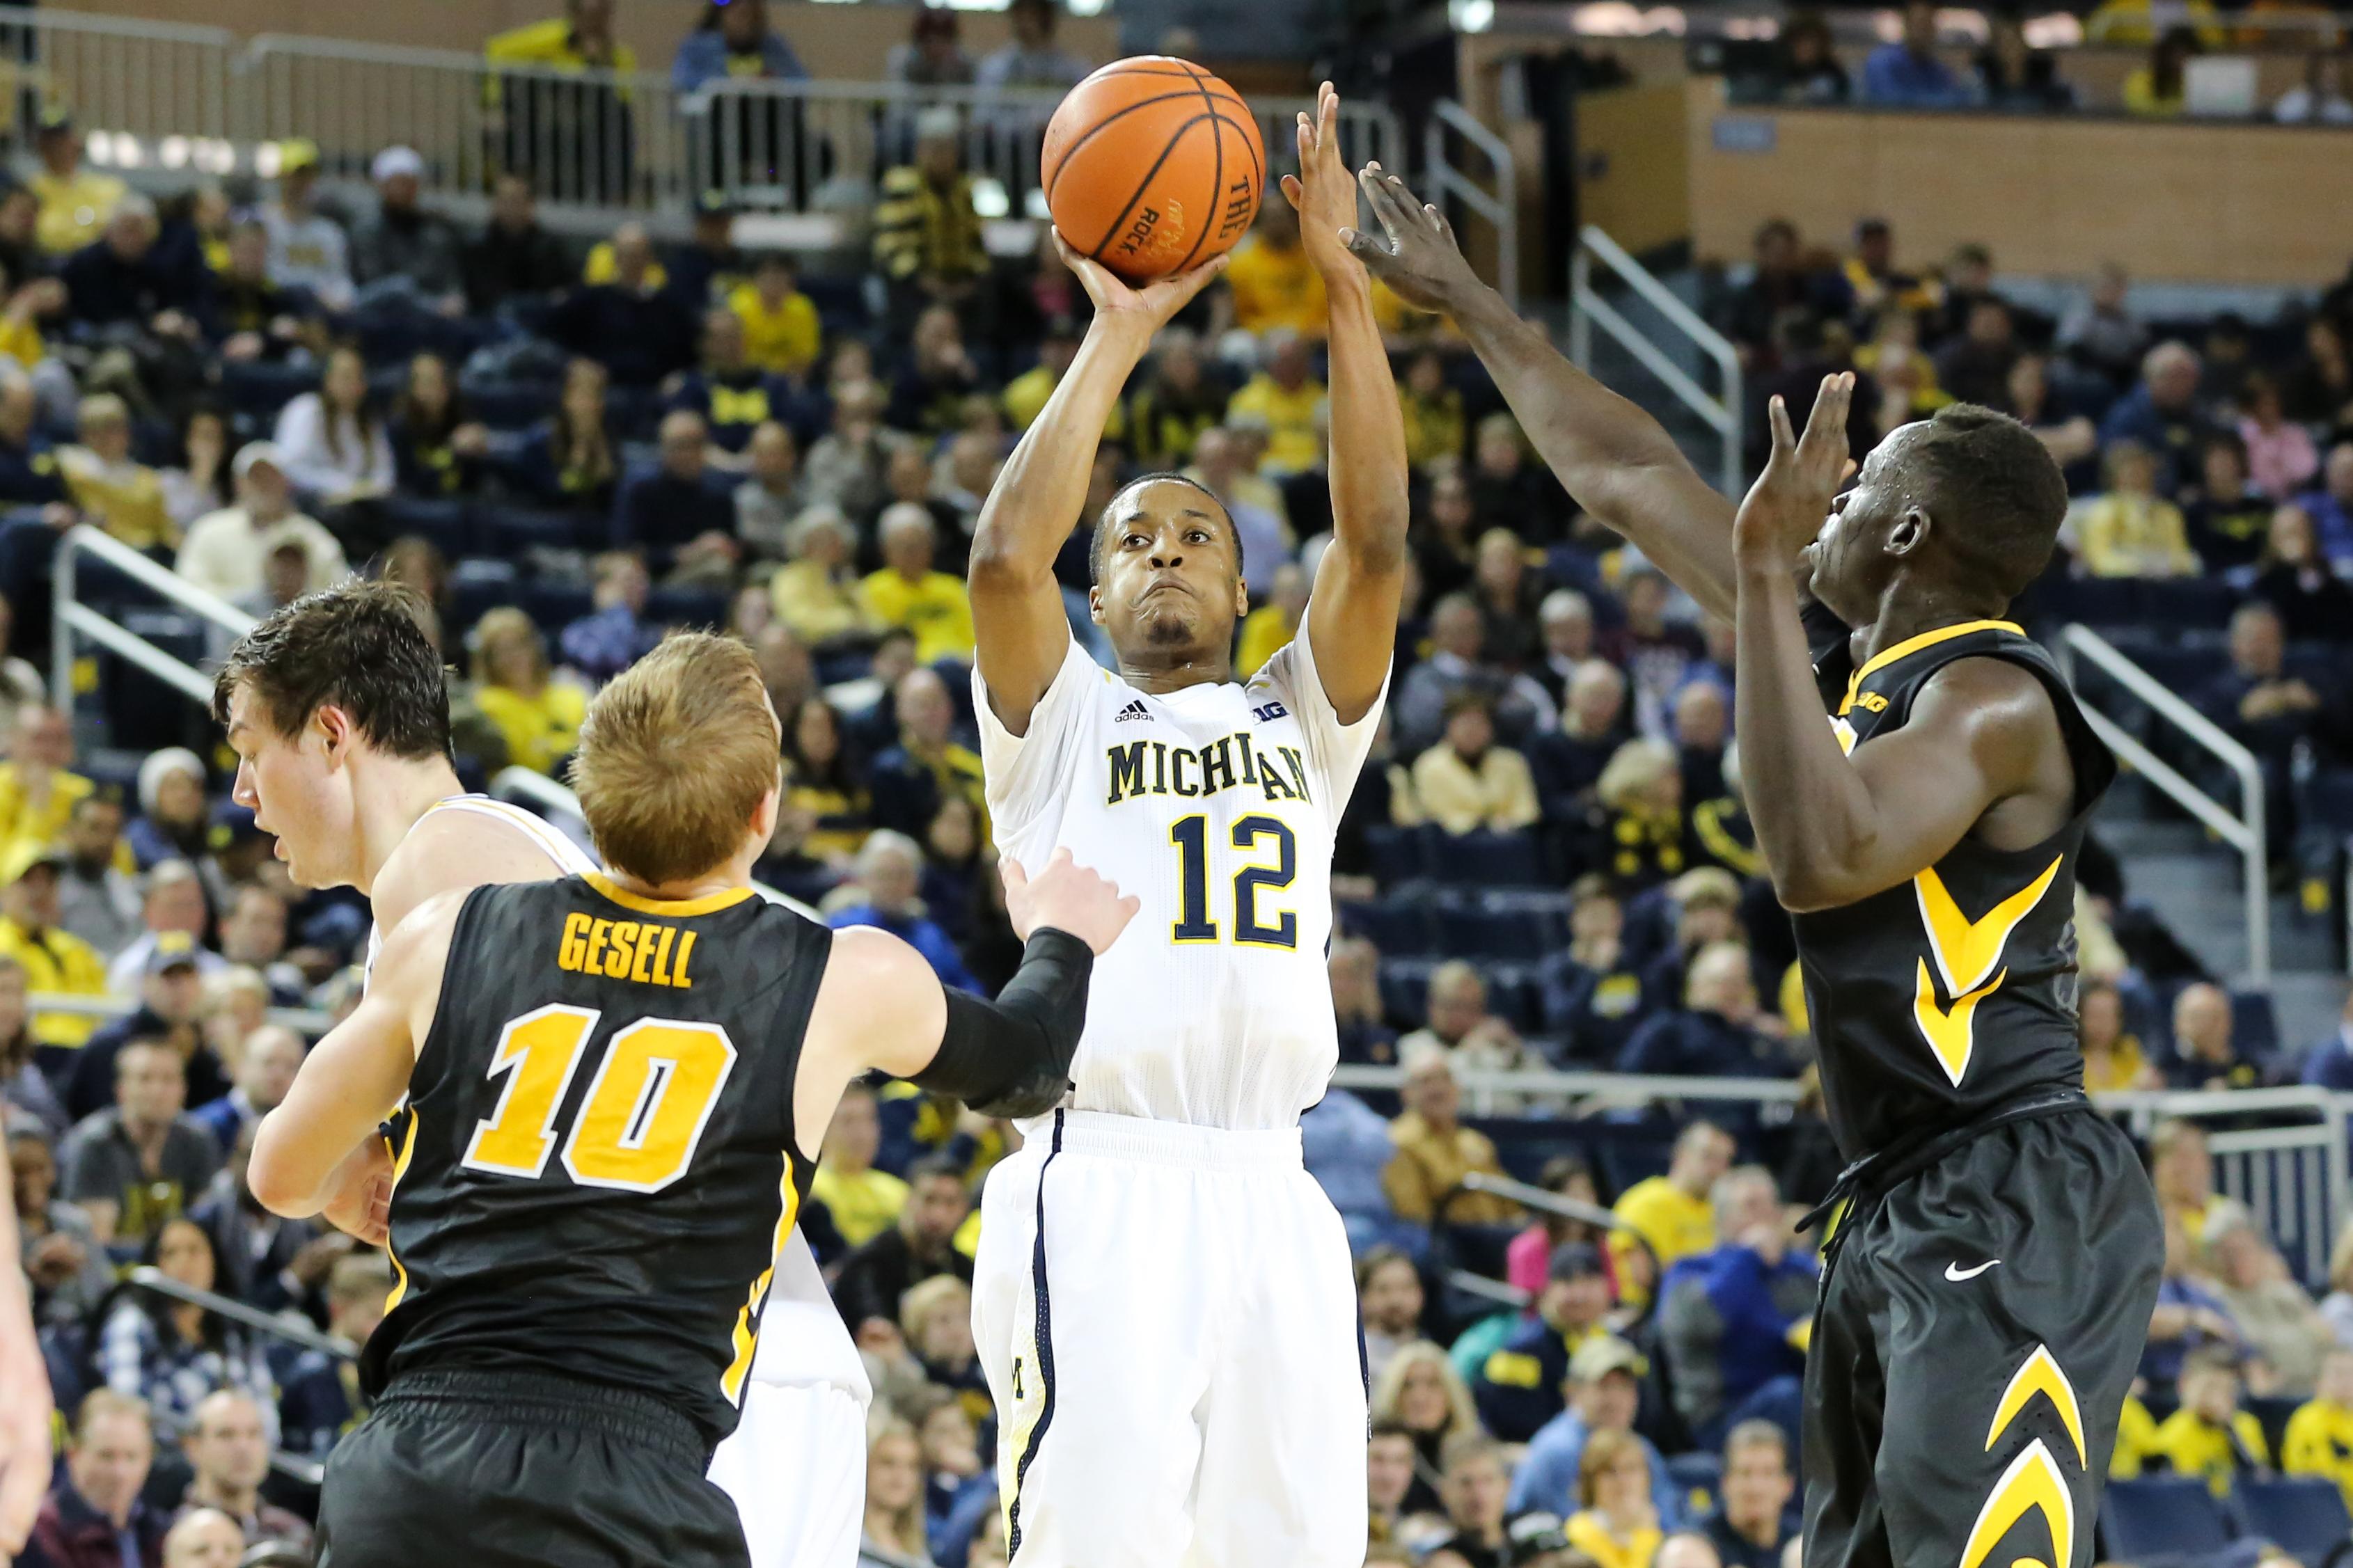 Michigan 54, Iowa 72-12